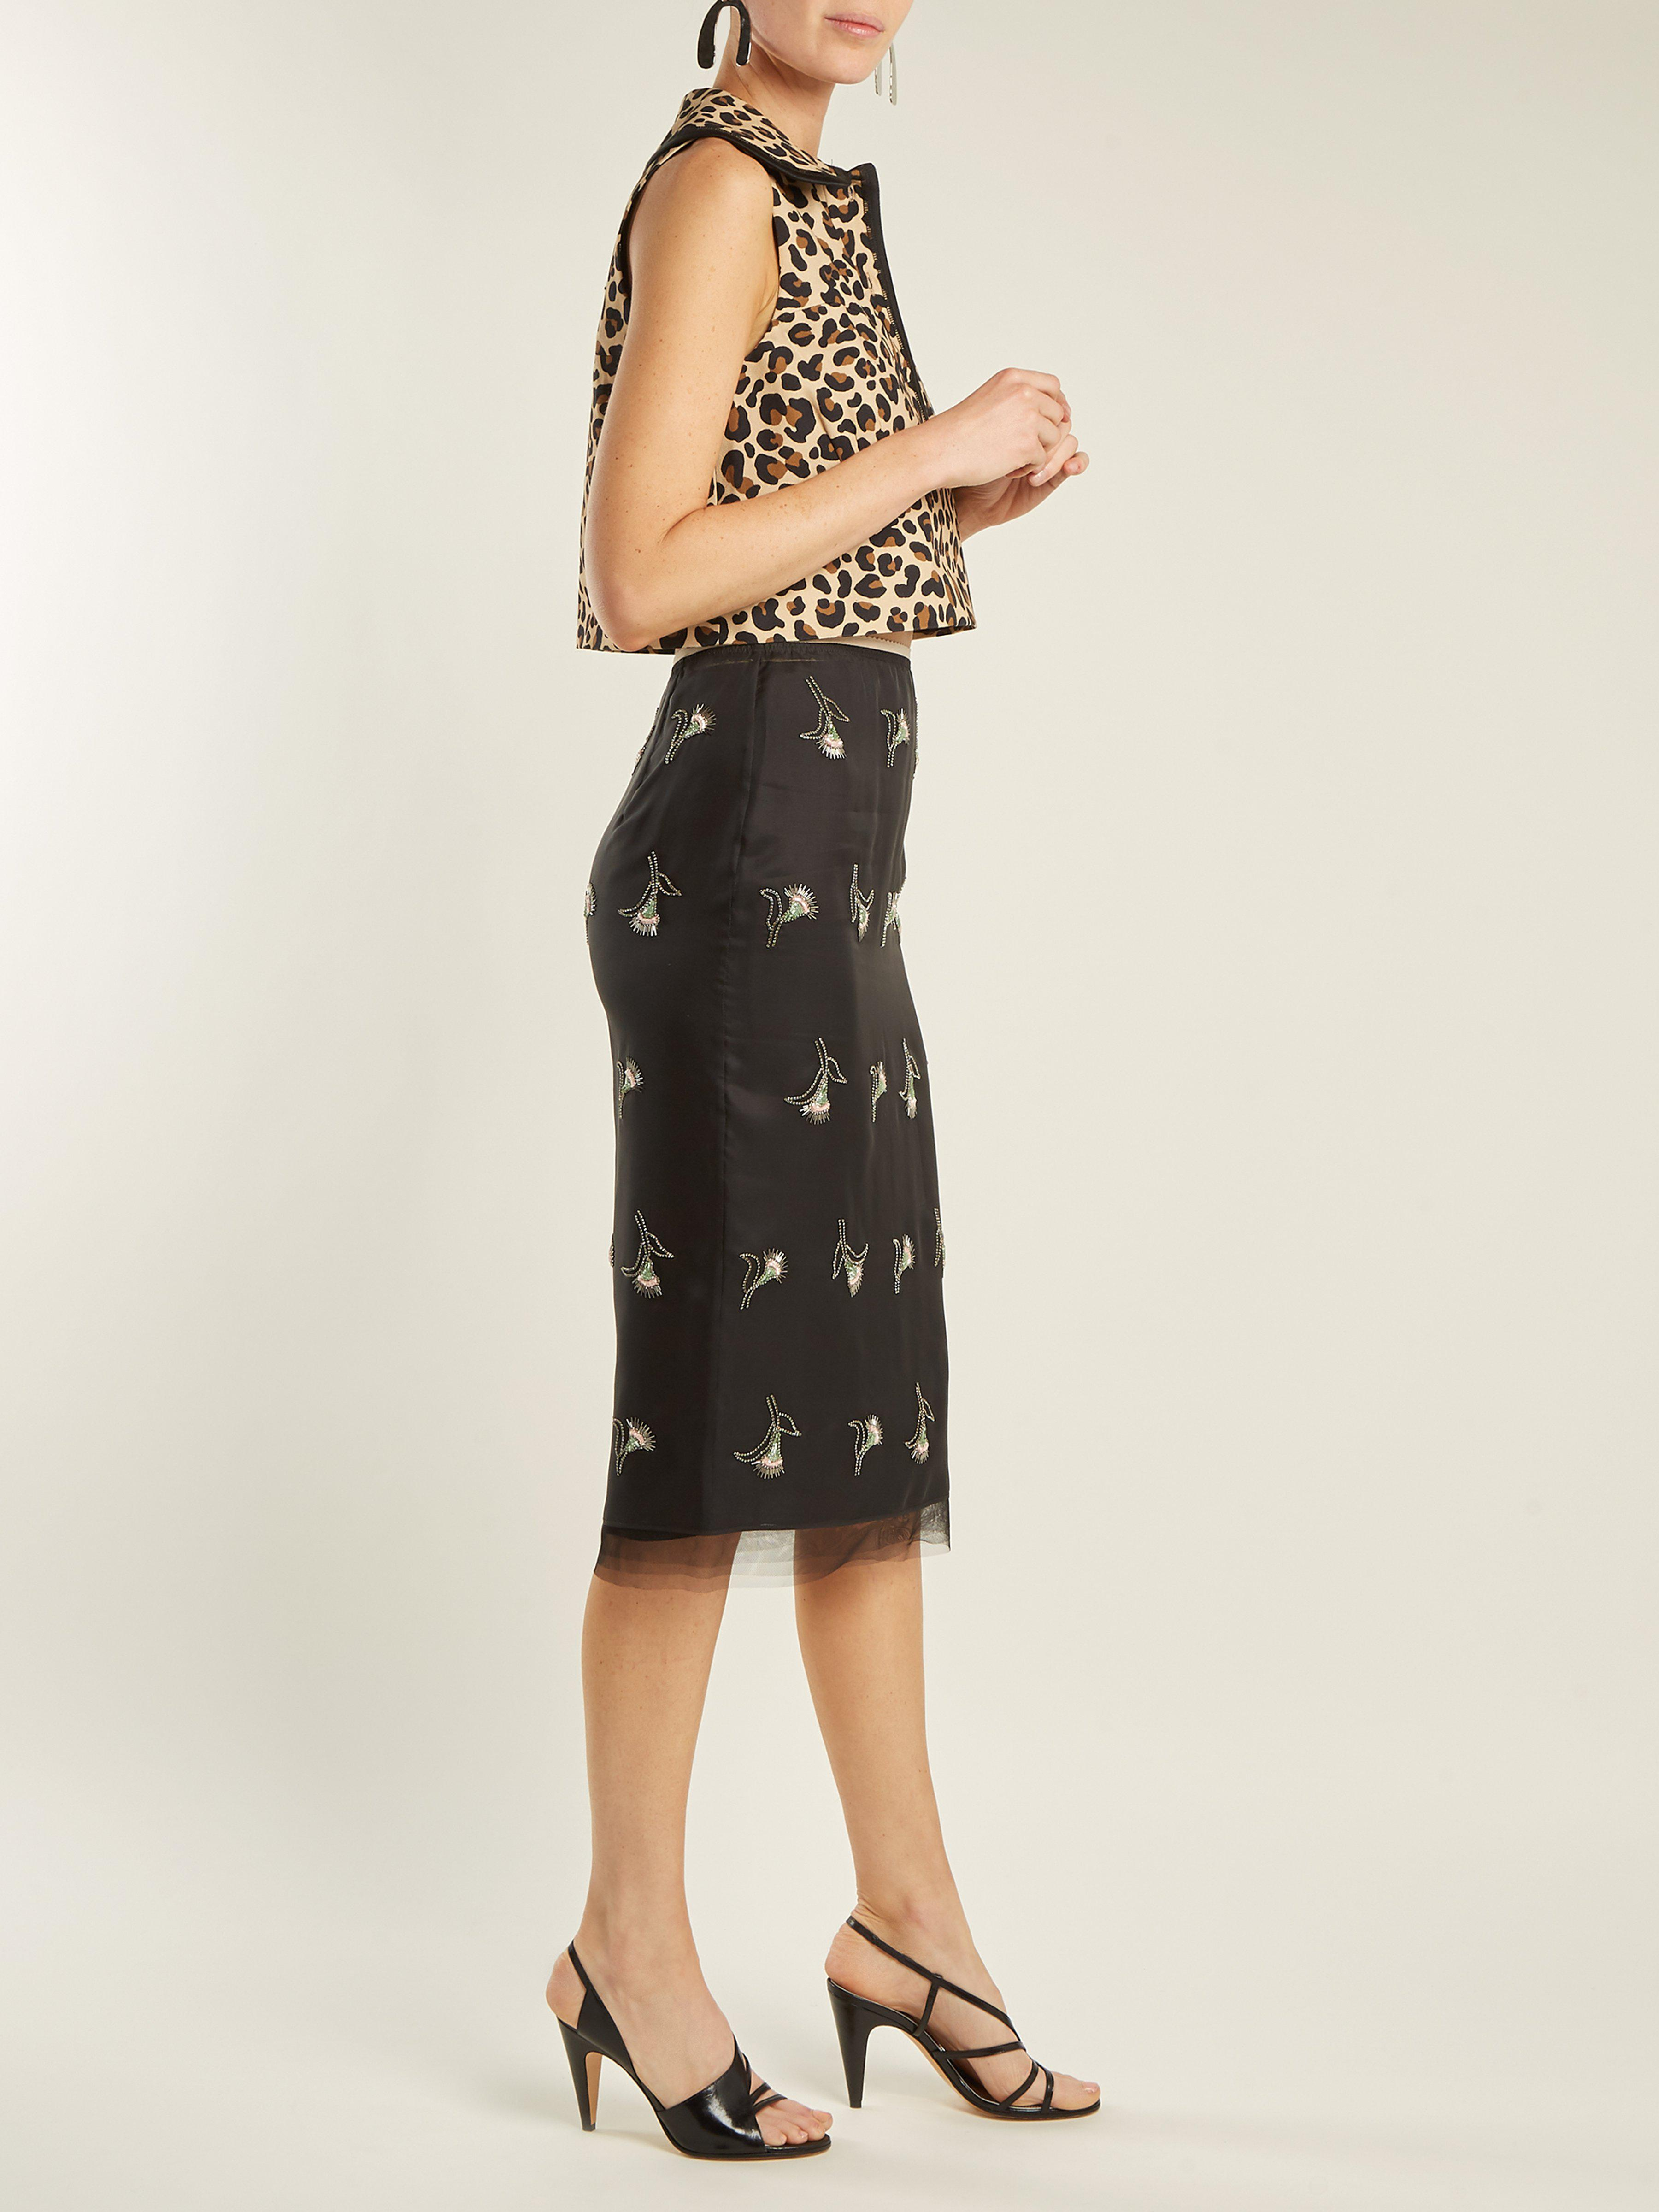 3012674a5020 Womens Black Bead Embellished Wrap Pencil Skirt – DACC